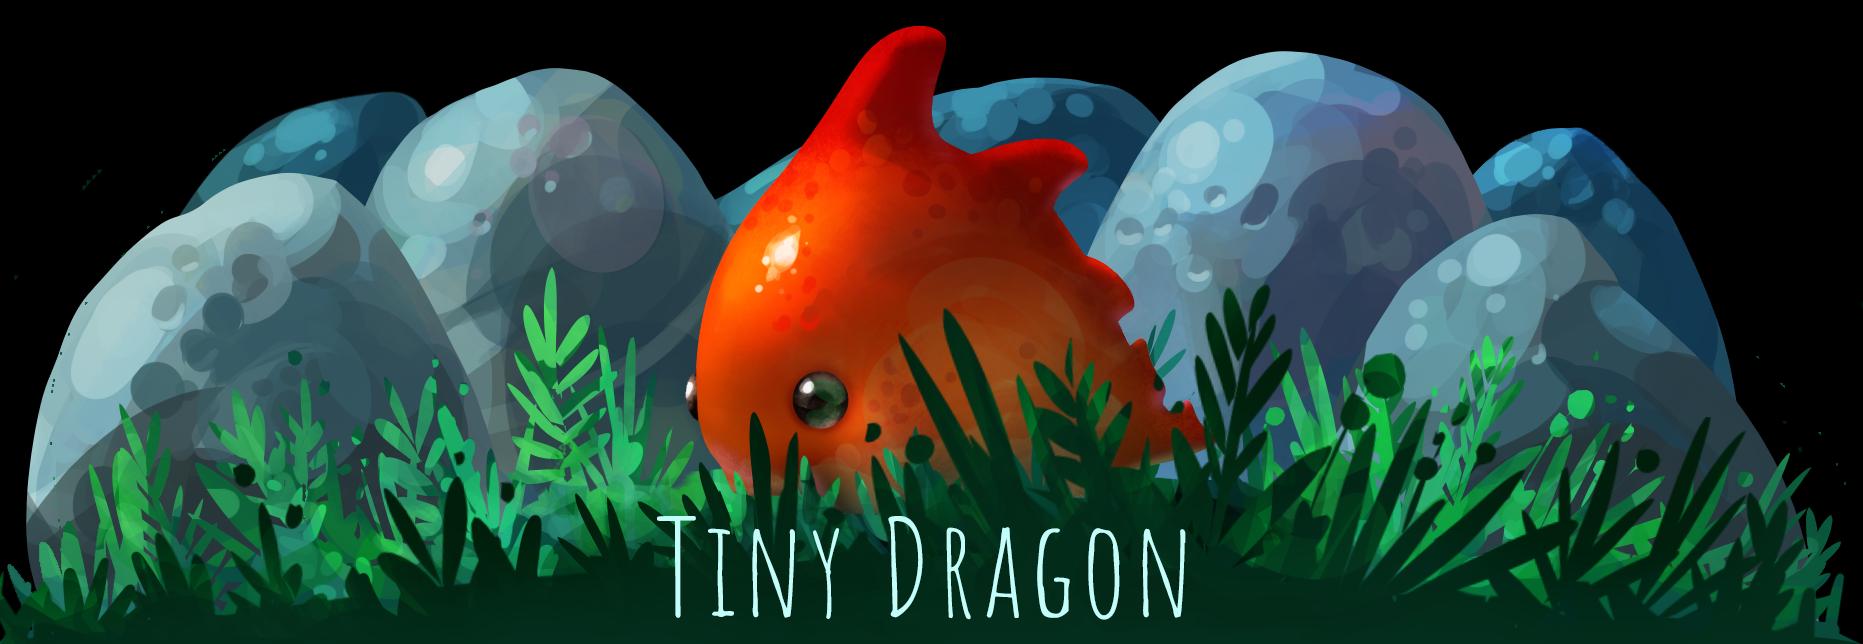 TinyDragon